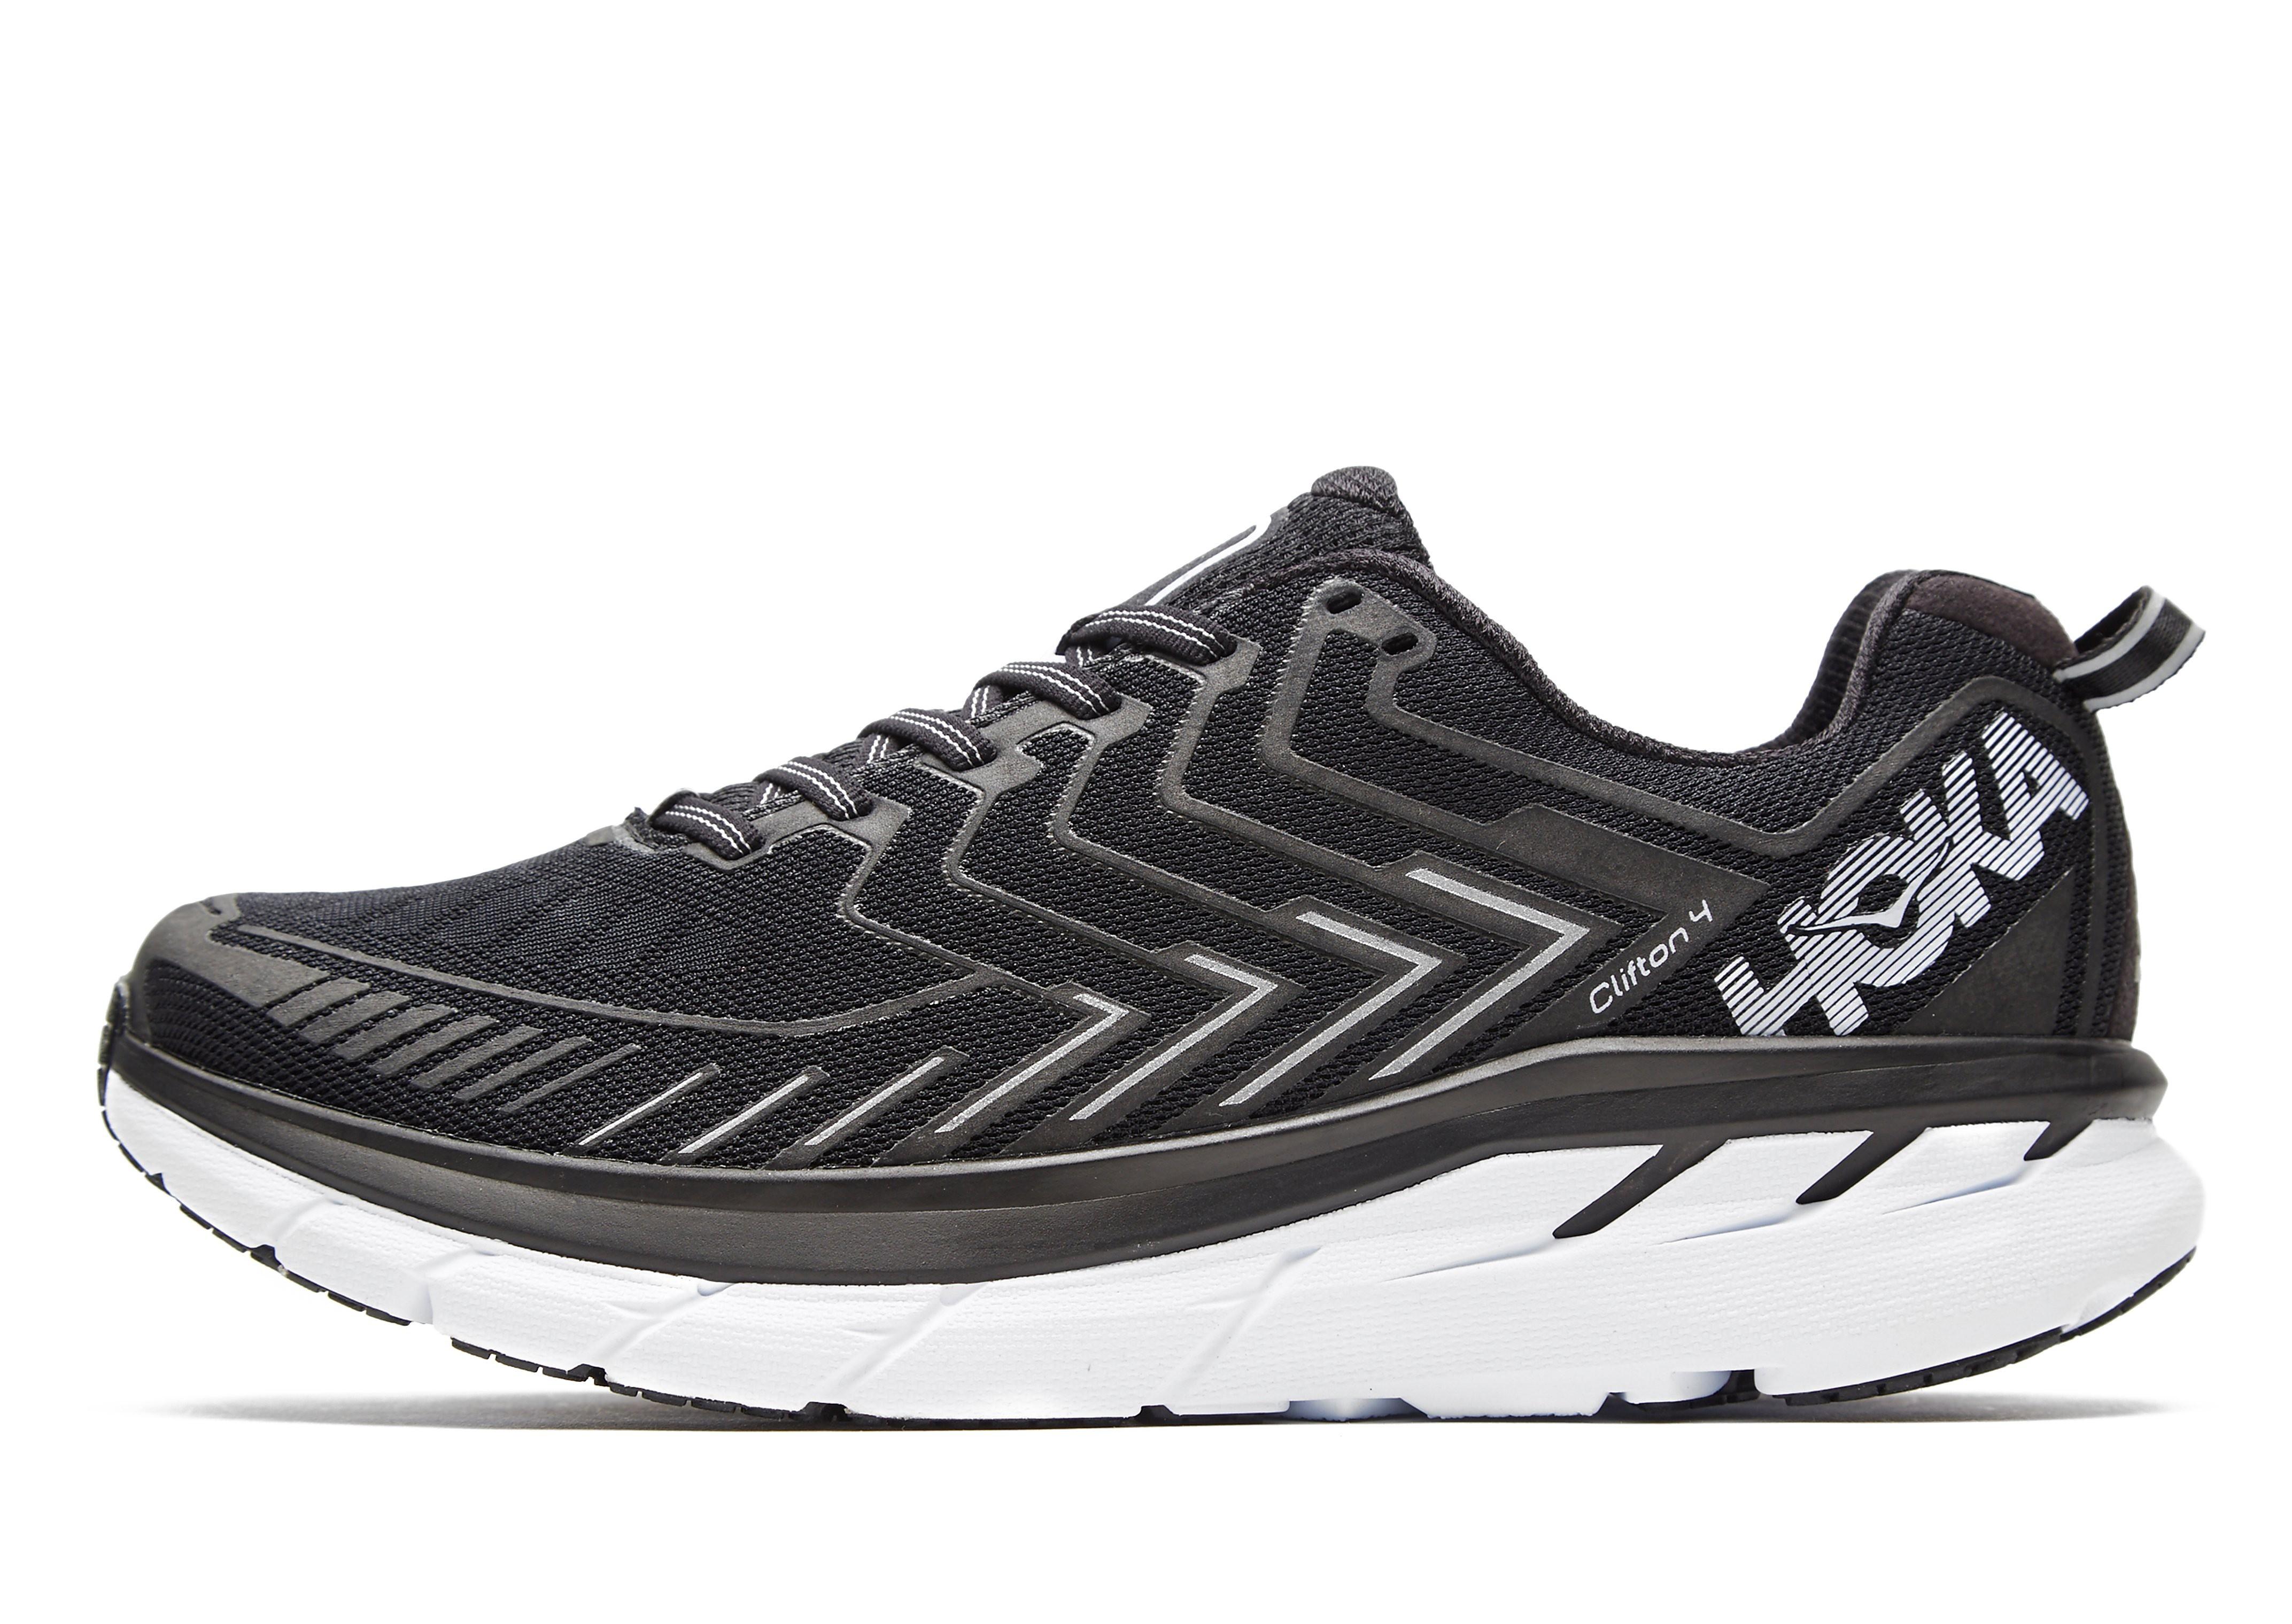 Hoka One One Clifton 4 Running Shoes